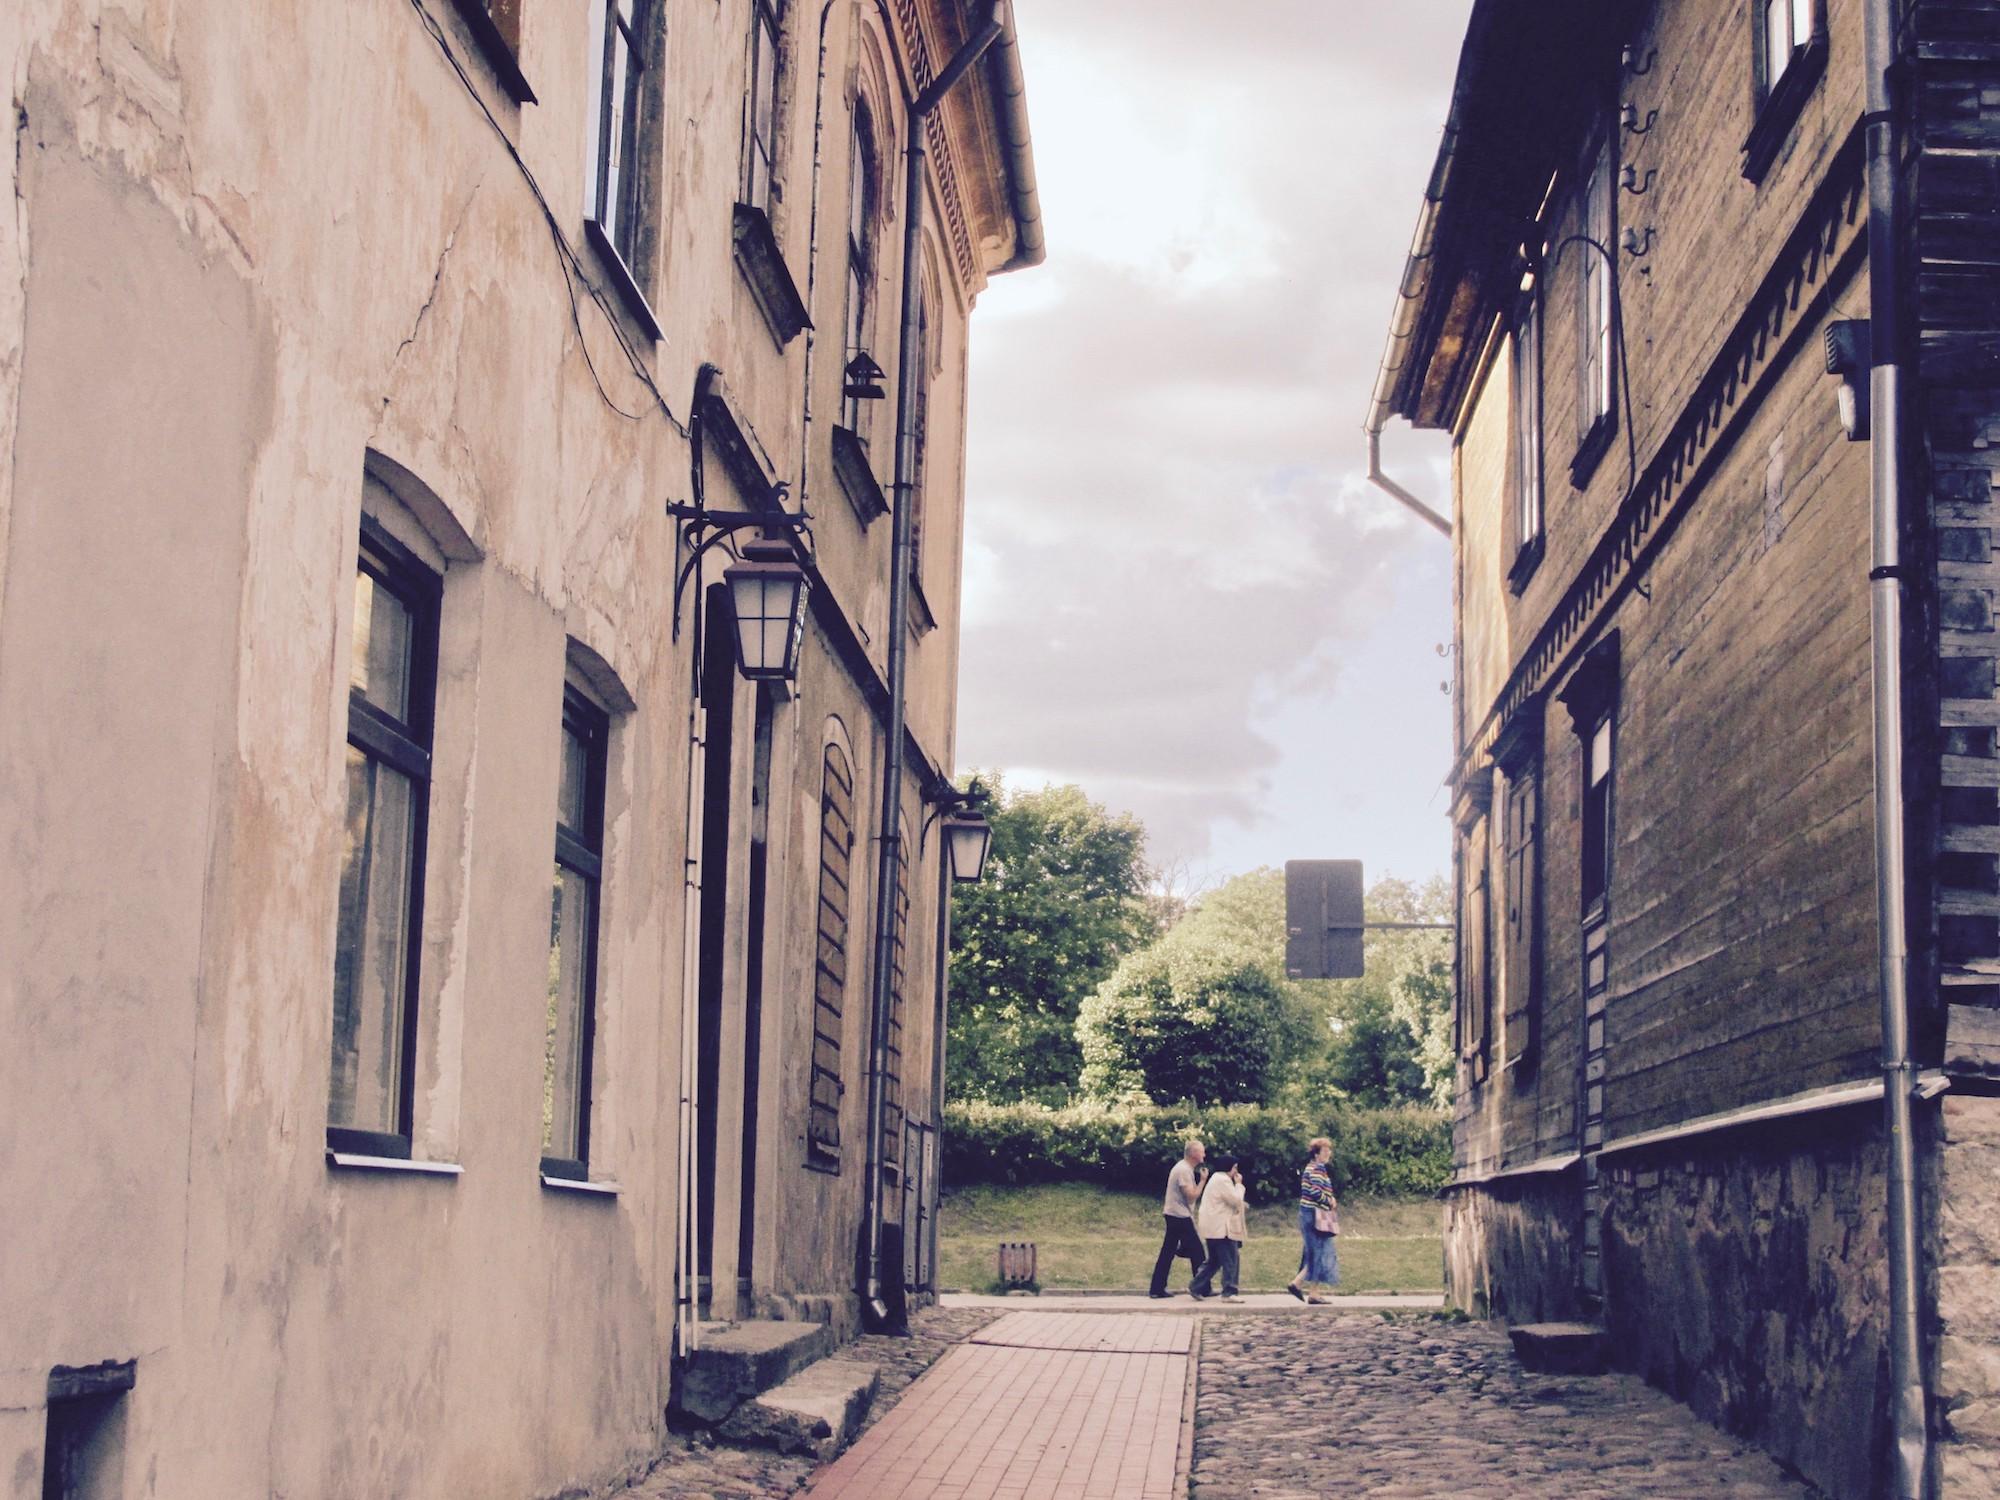 Local people enjoying the weekend in Old Town of Cesis.